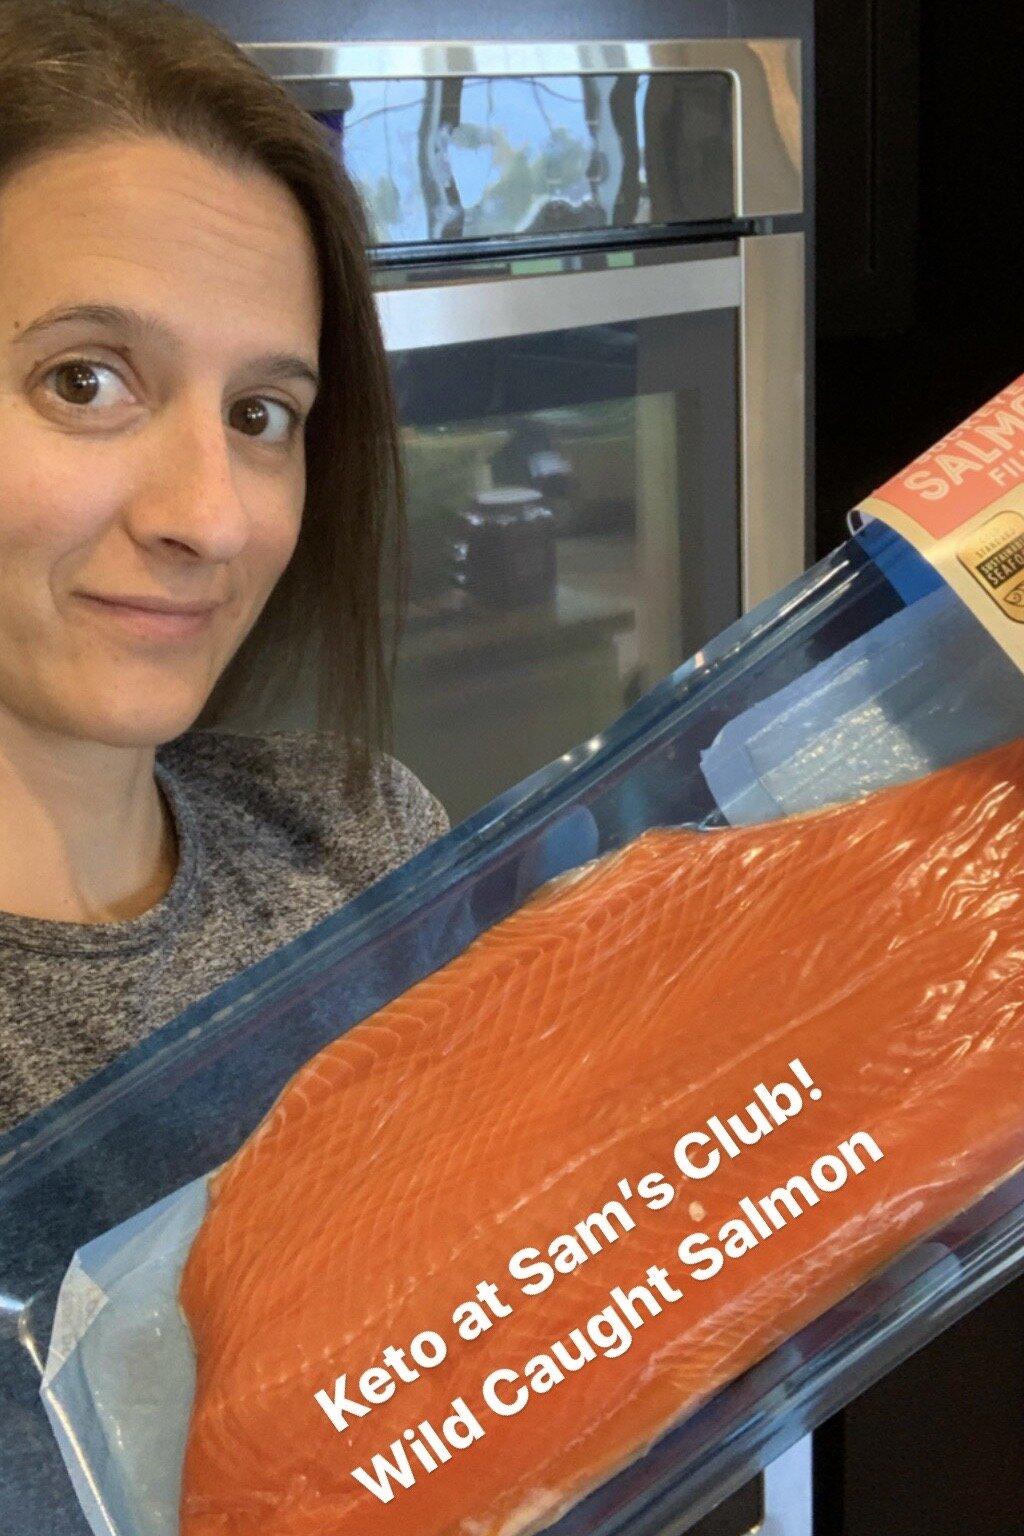 The Keto Dad Sam's Club Shopping List Ketogenic Lifestyle diet groceries